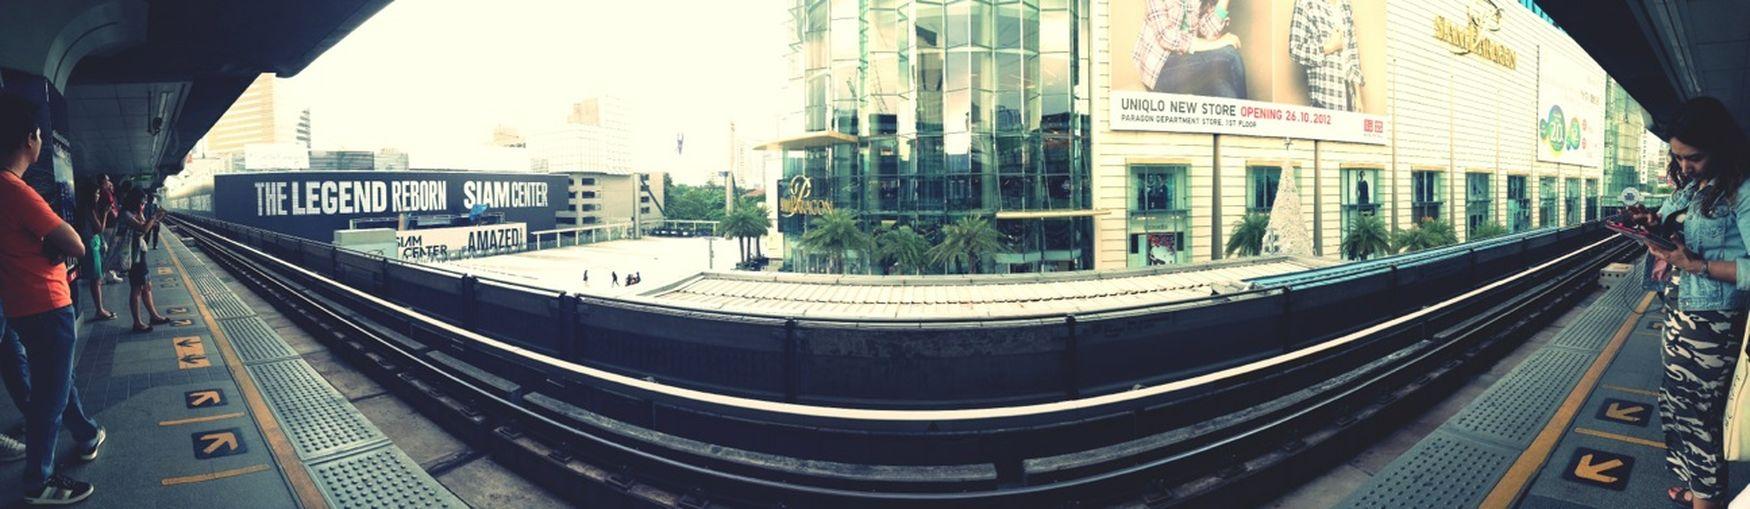 Taking My First Panoramic Photo